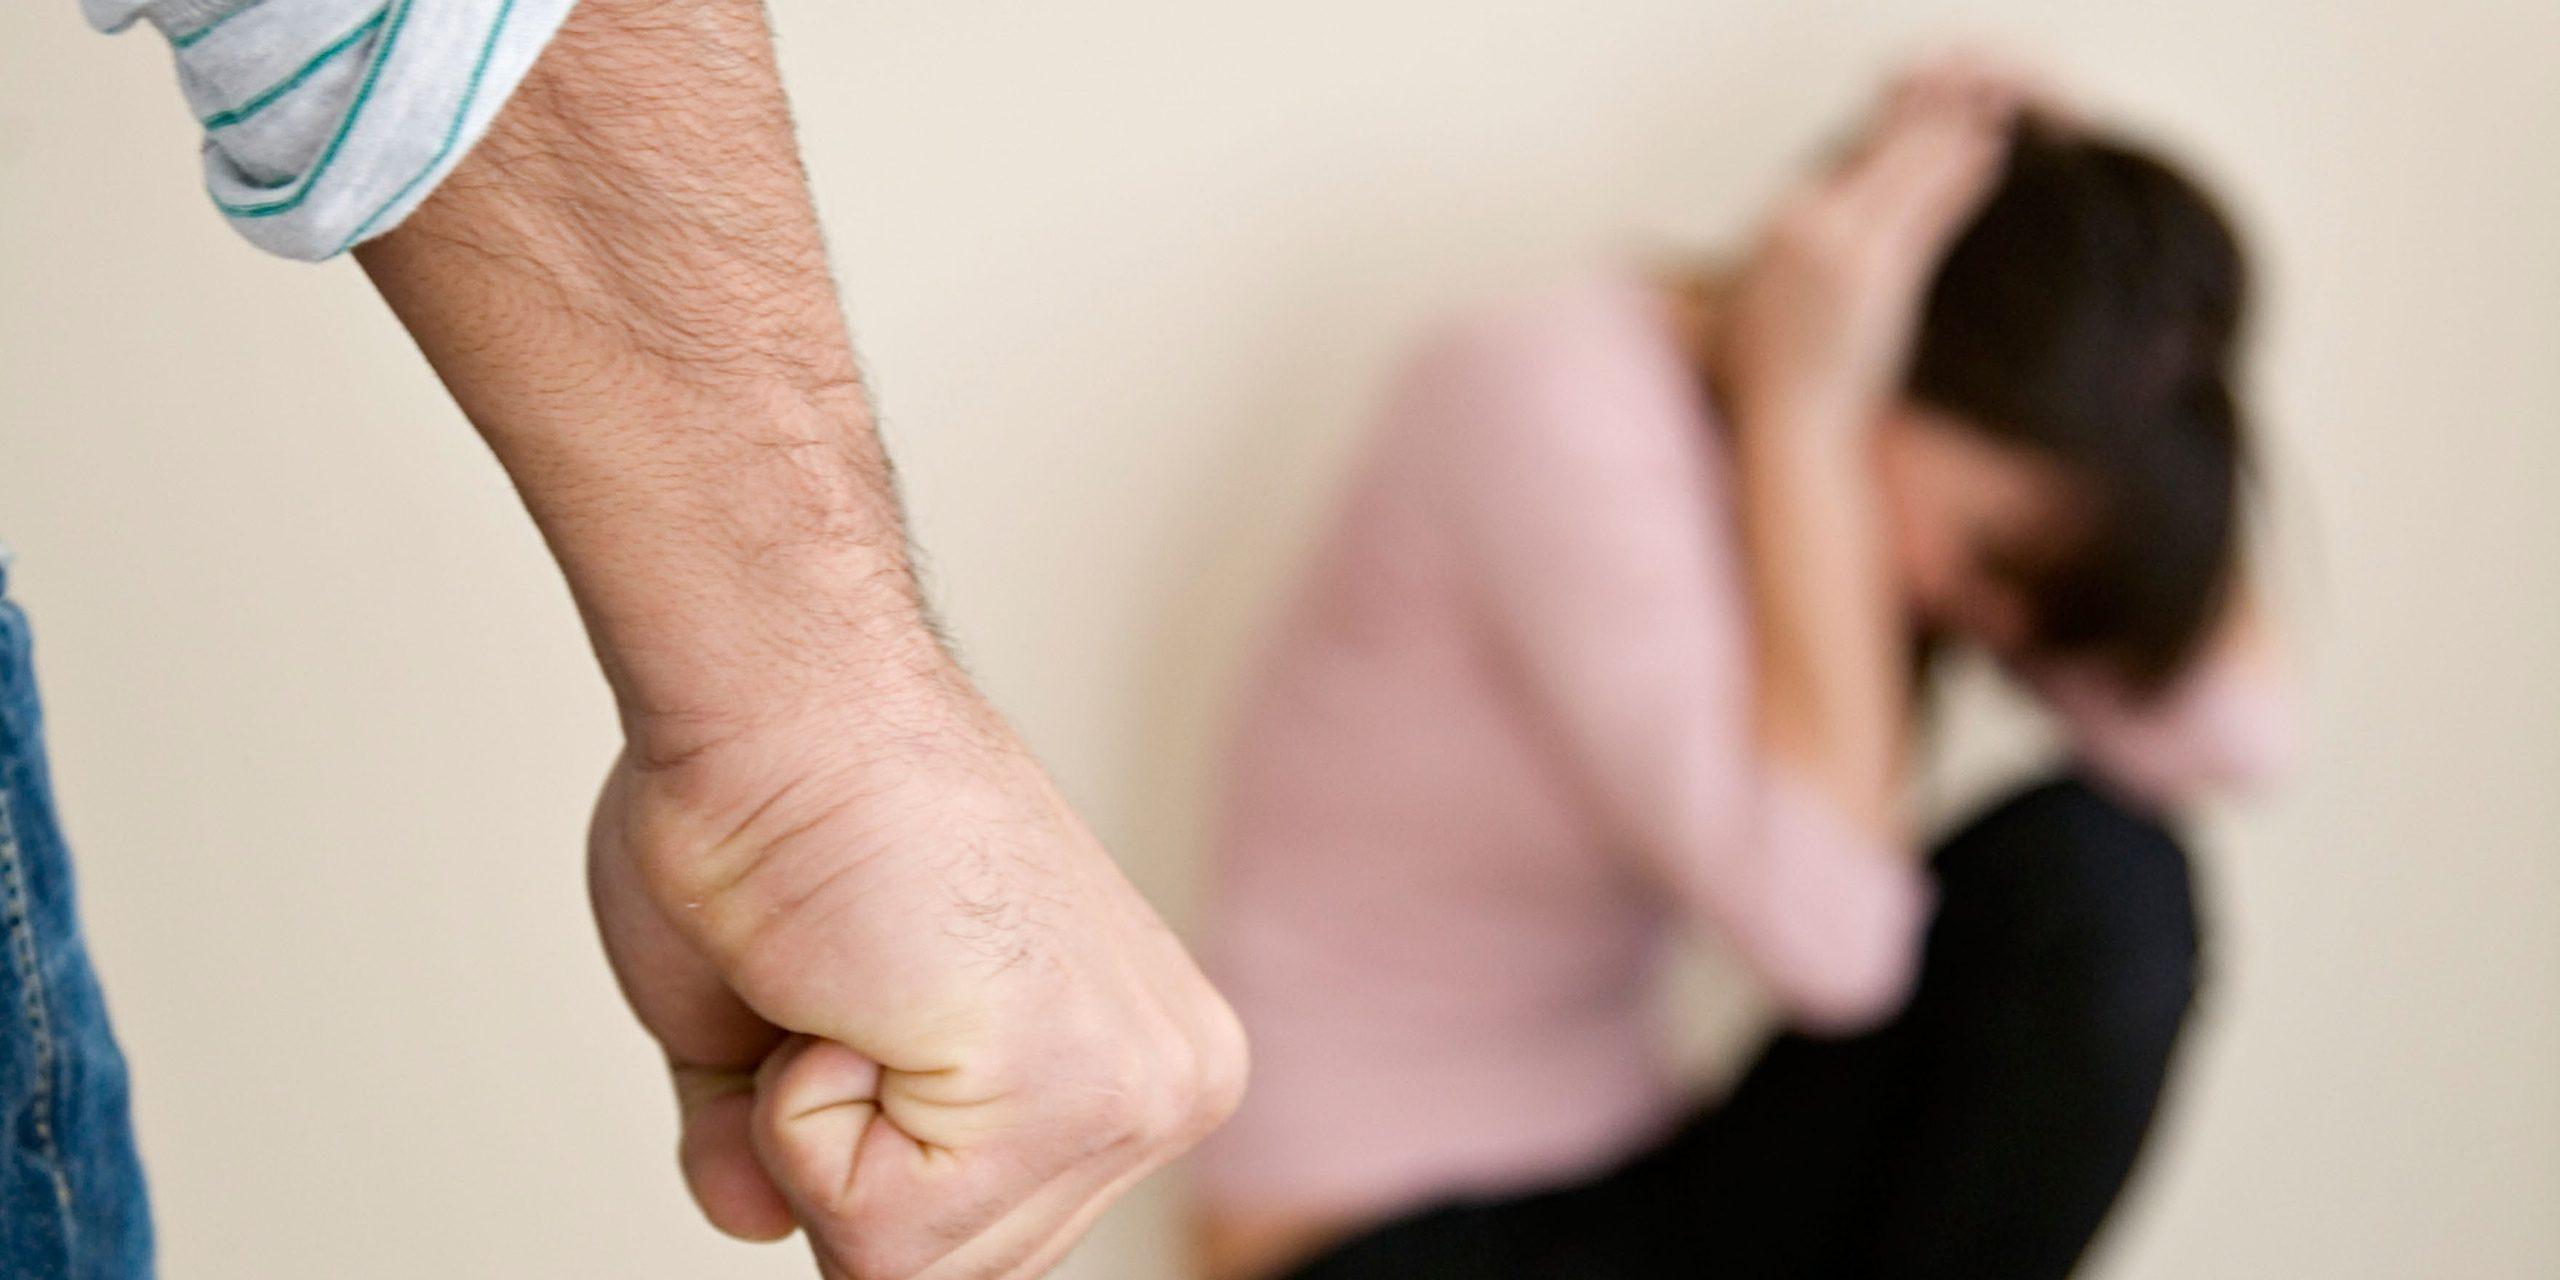 violencia-doméstica-agressão-2560x1280